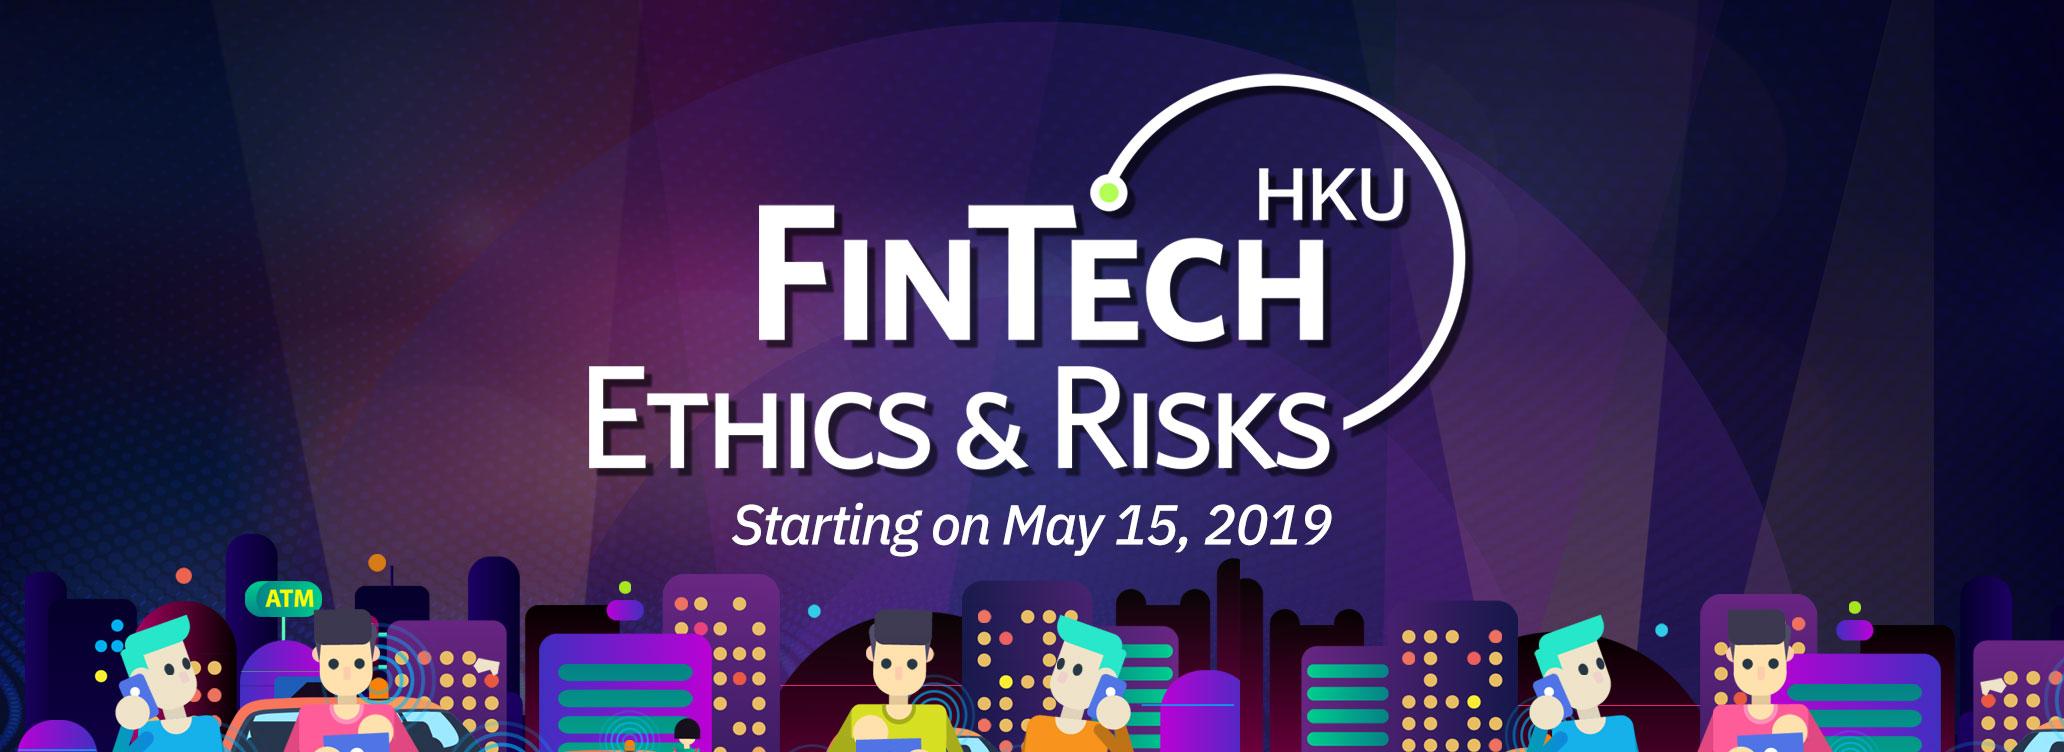 fintech-ethics-and-risks